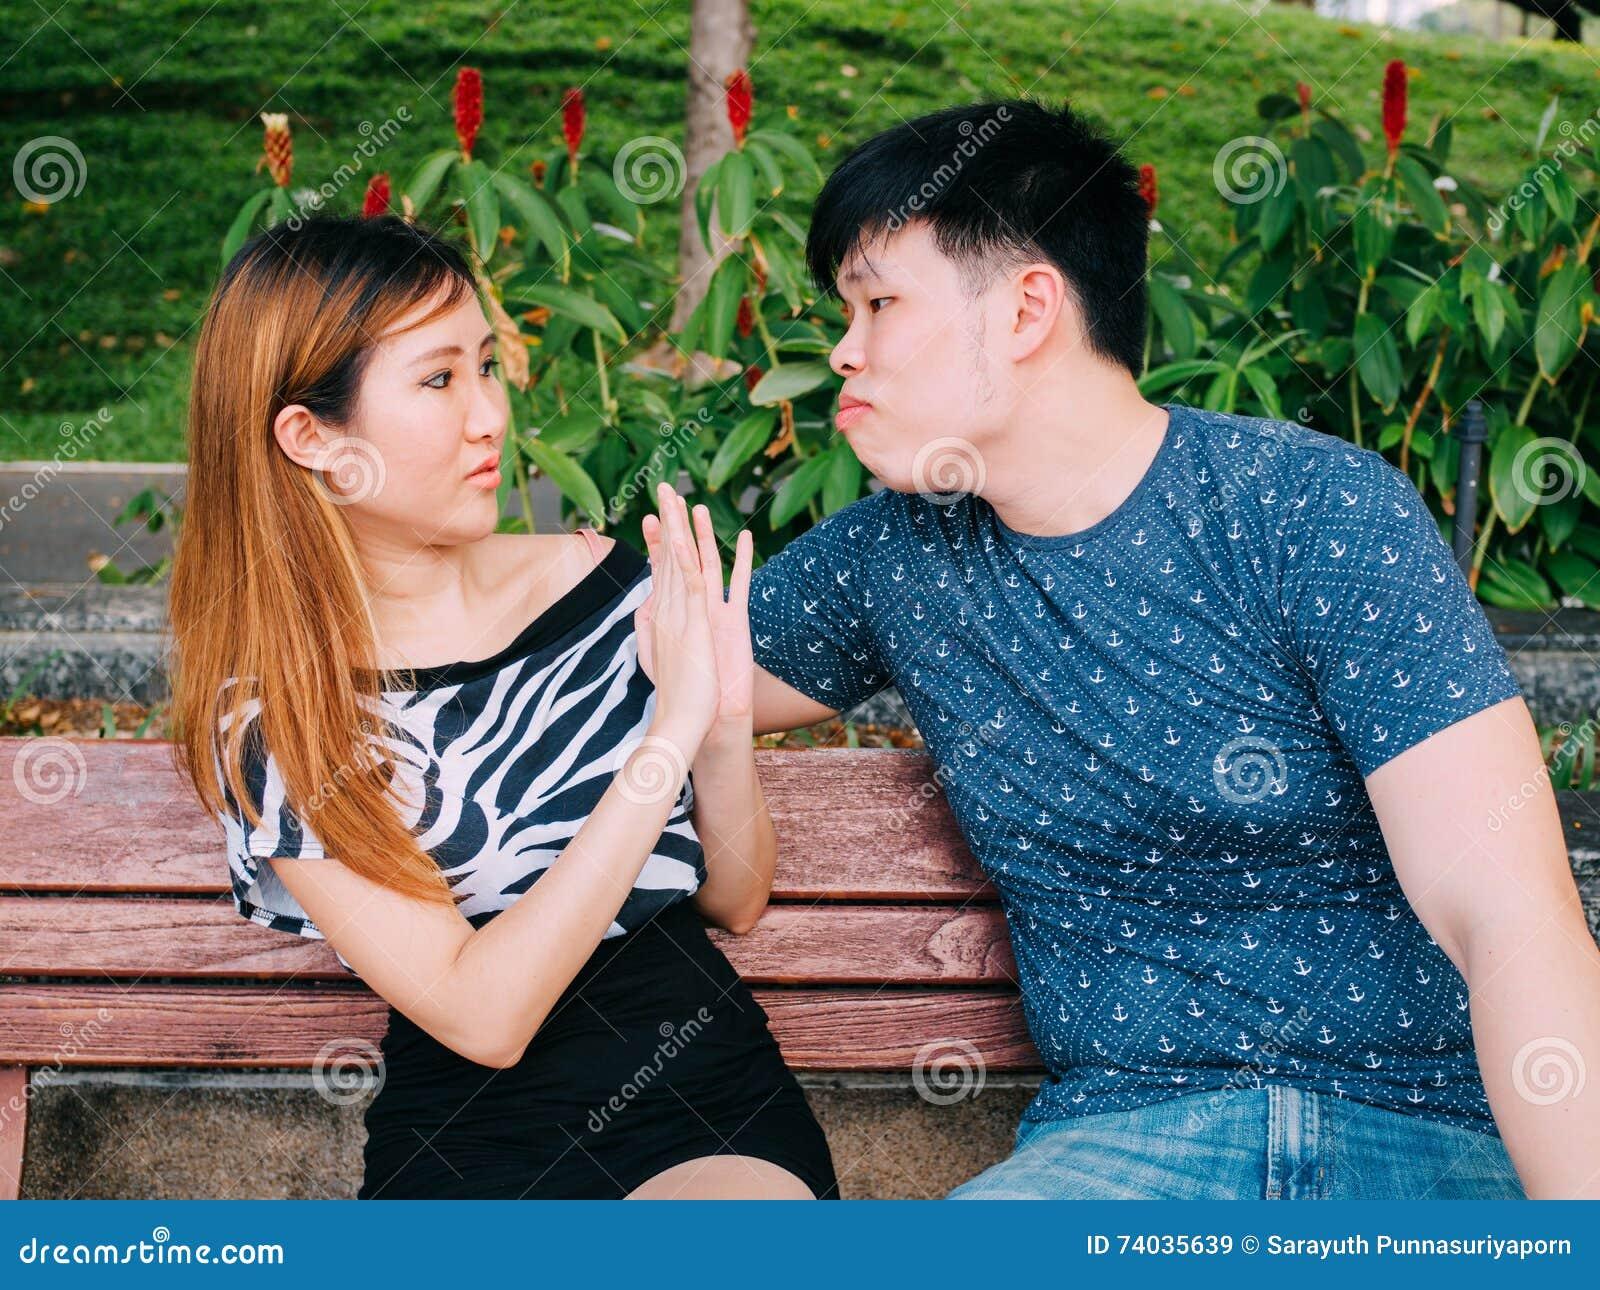 asiatico uomo dating bianco ragazza loveawake gratis online dating